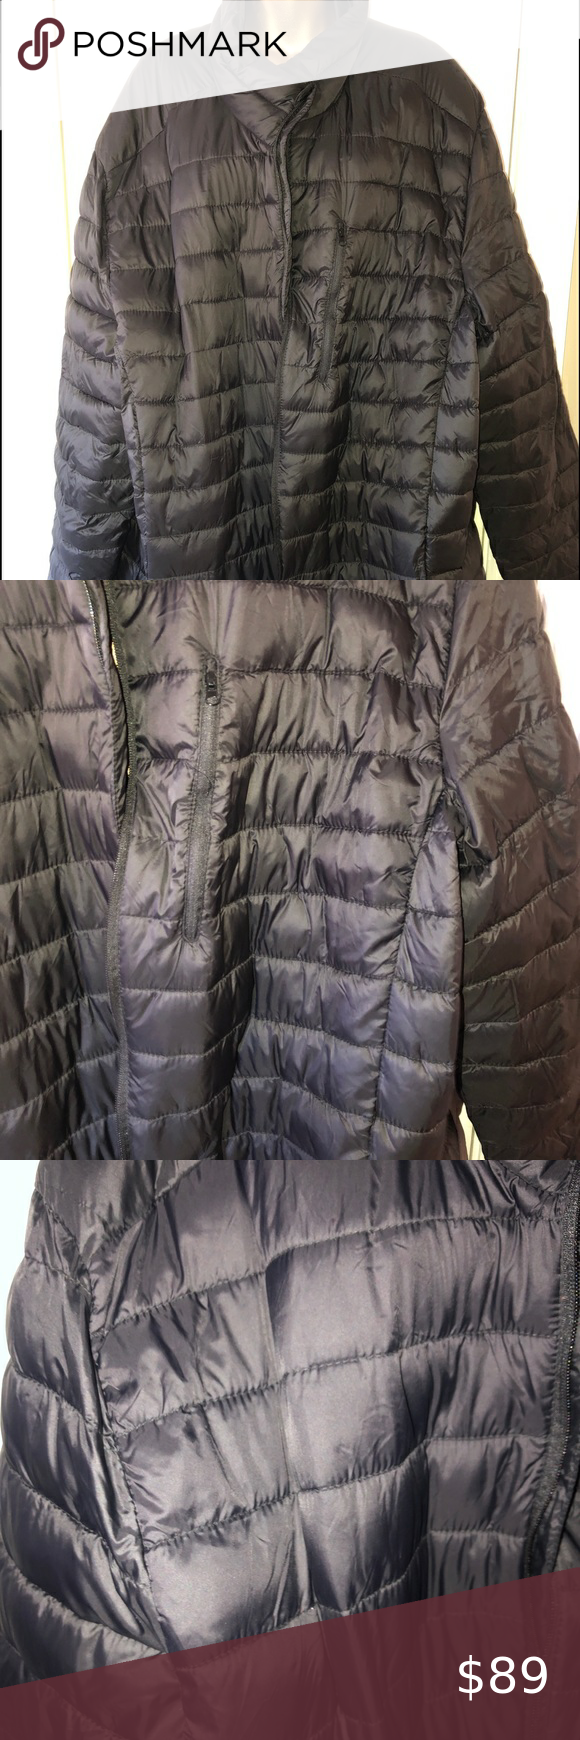 Foundry Black Puffer Jacket Aize 3xl Tall Foundry Black Puffer Jacket Size 3xl Y All Pack Able Brand New With T Black Puffer Jacket Black Puffer Puffer Jackets [ 1740 x 580 Pixel ]